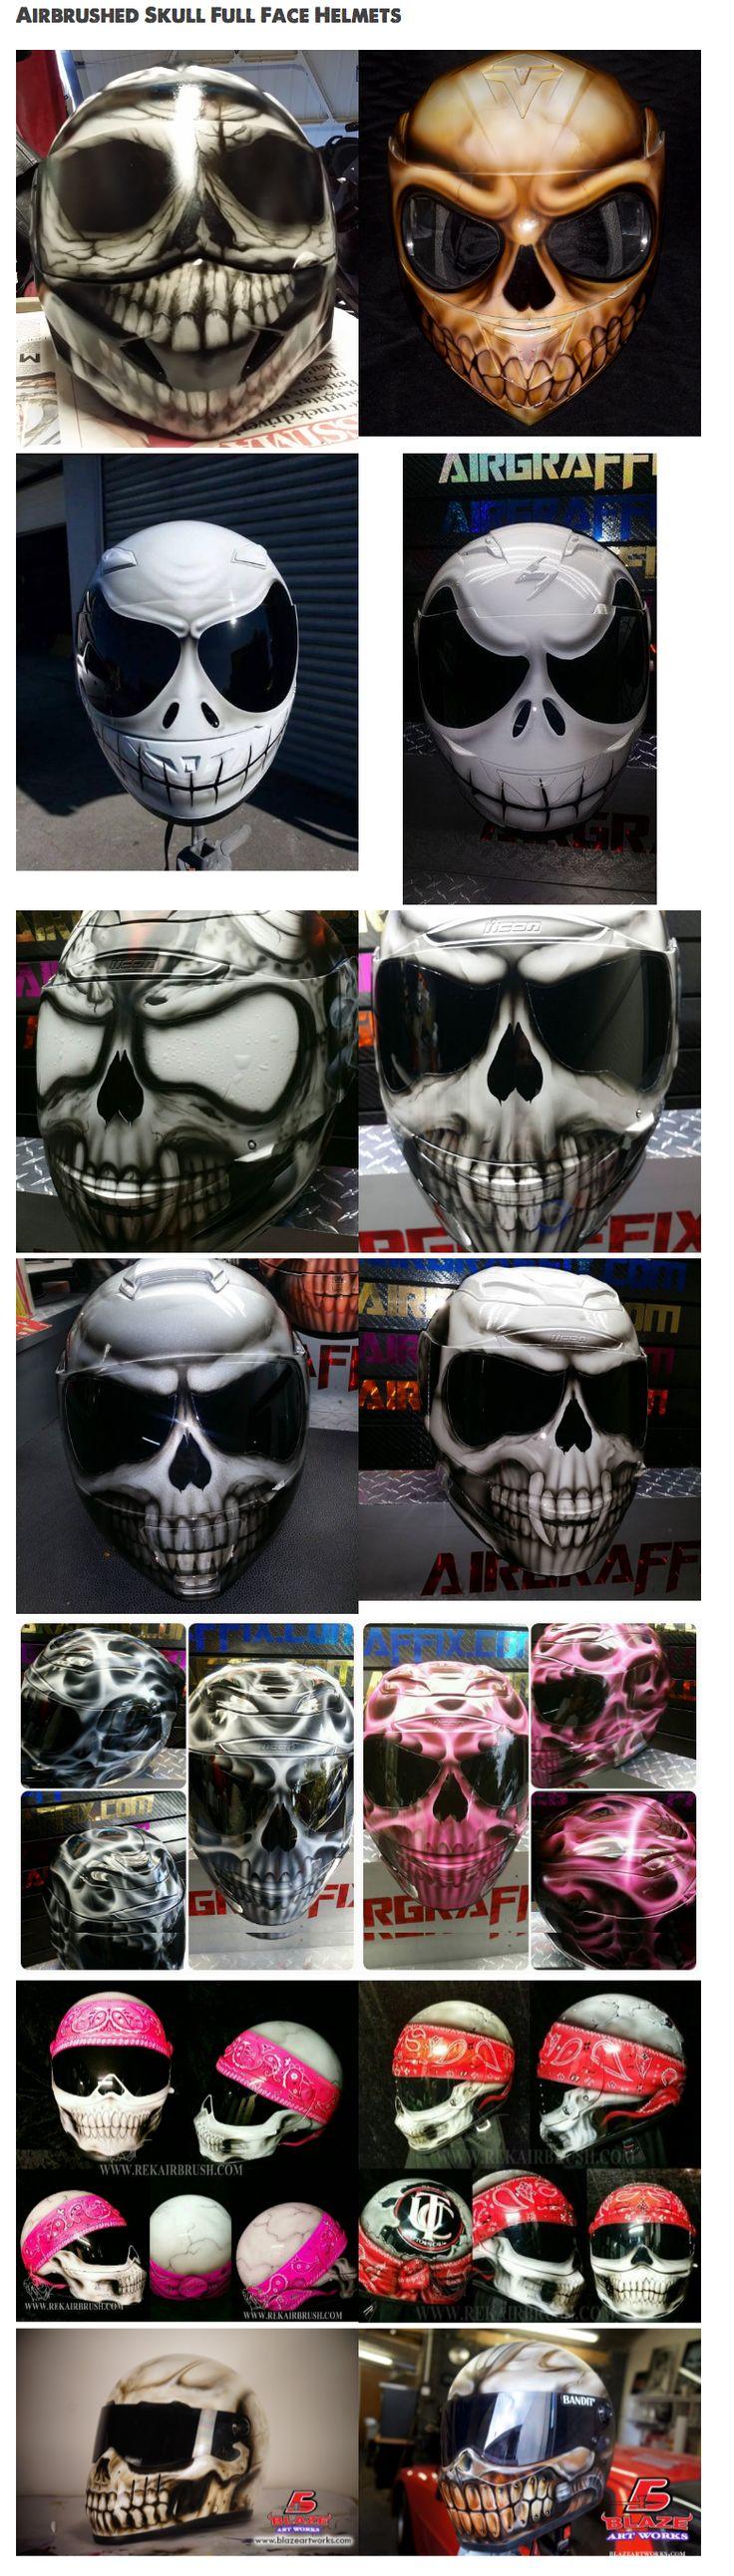 Airbrushed Skull Motorcycle Helmets